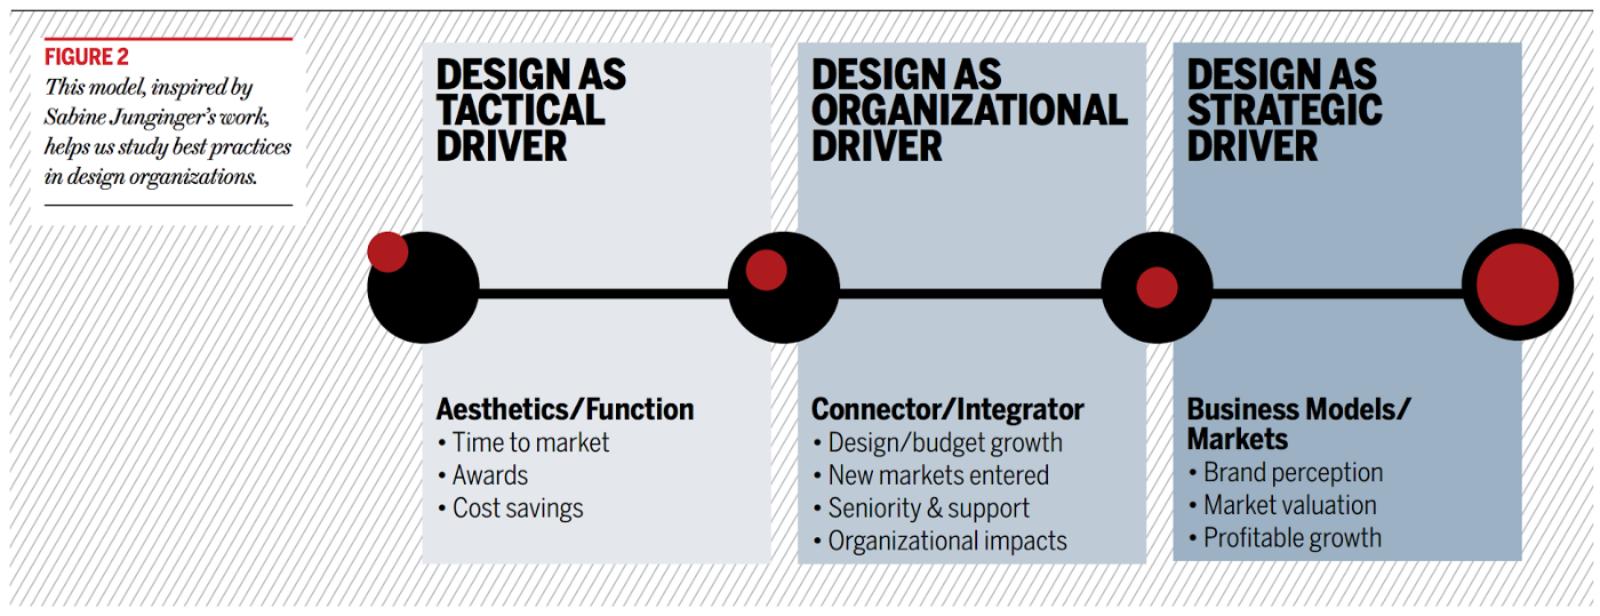 An image of the DMI Design Value Scorecard